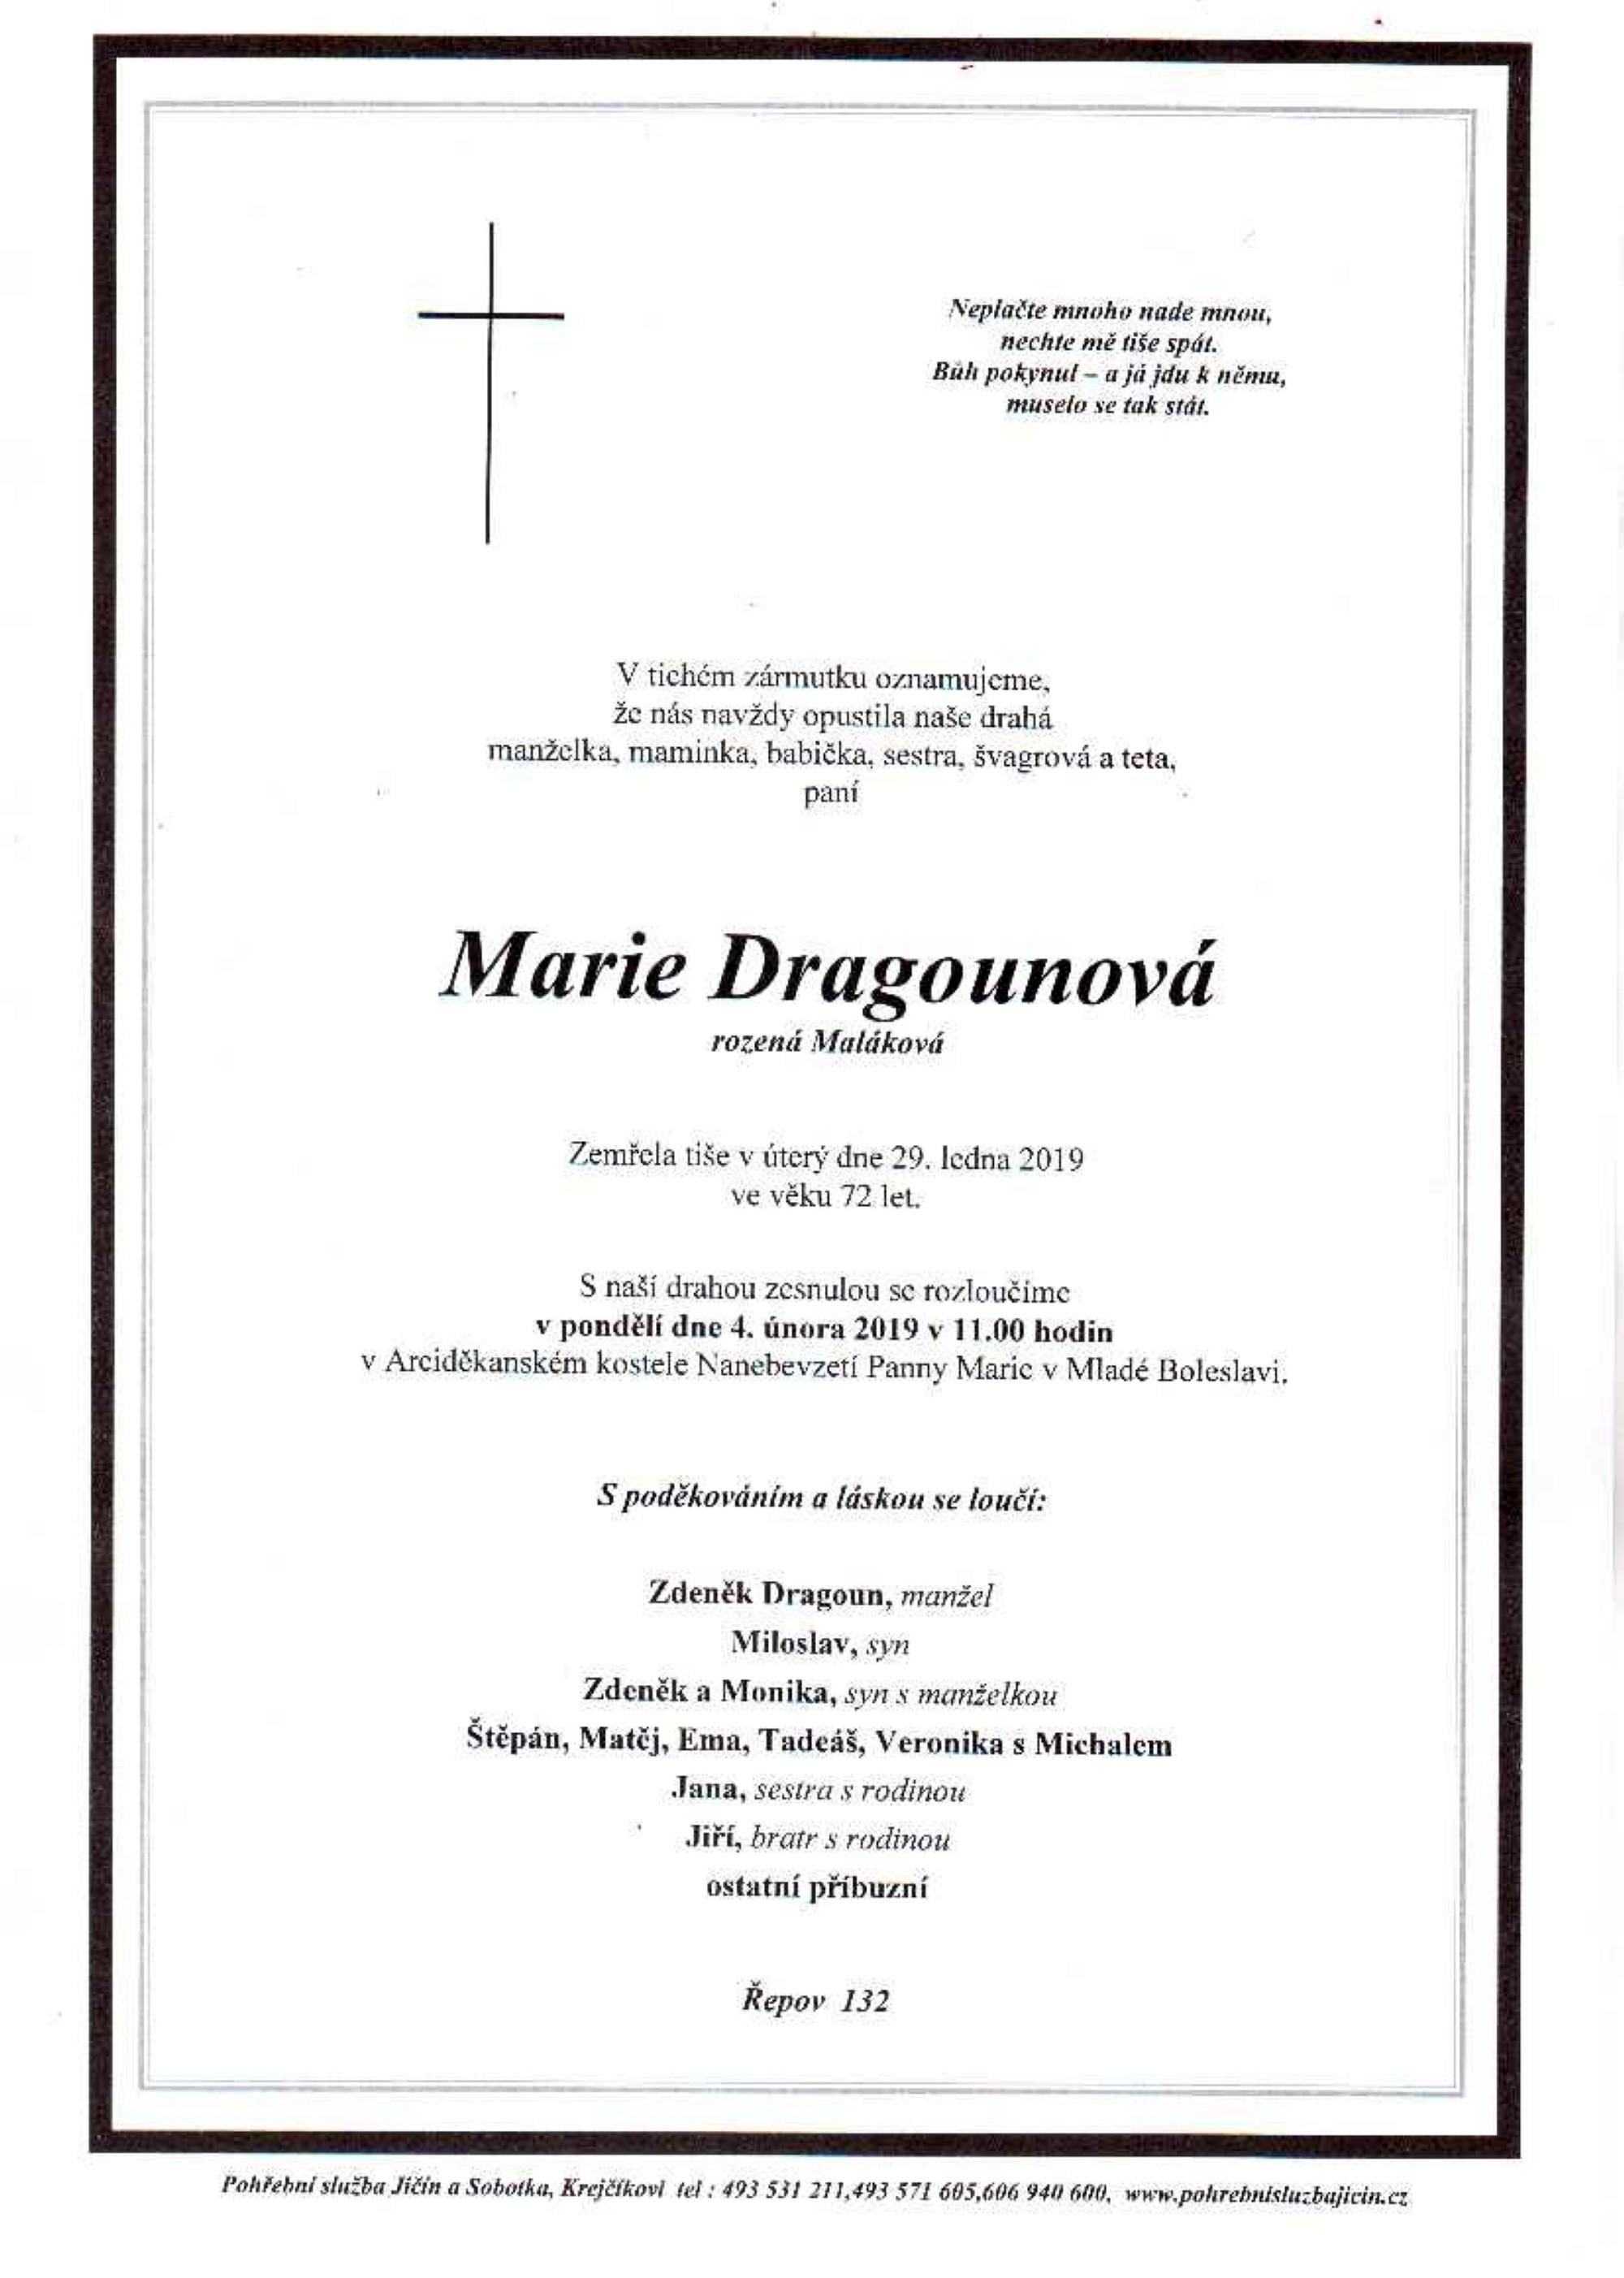 Marie Dragounová